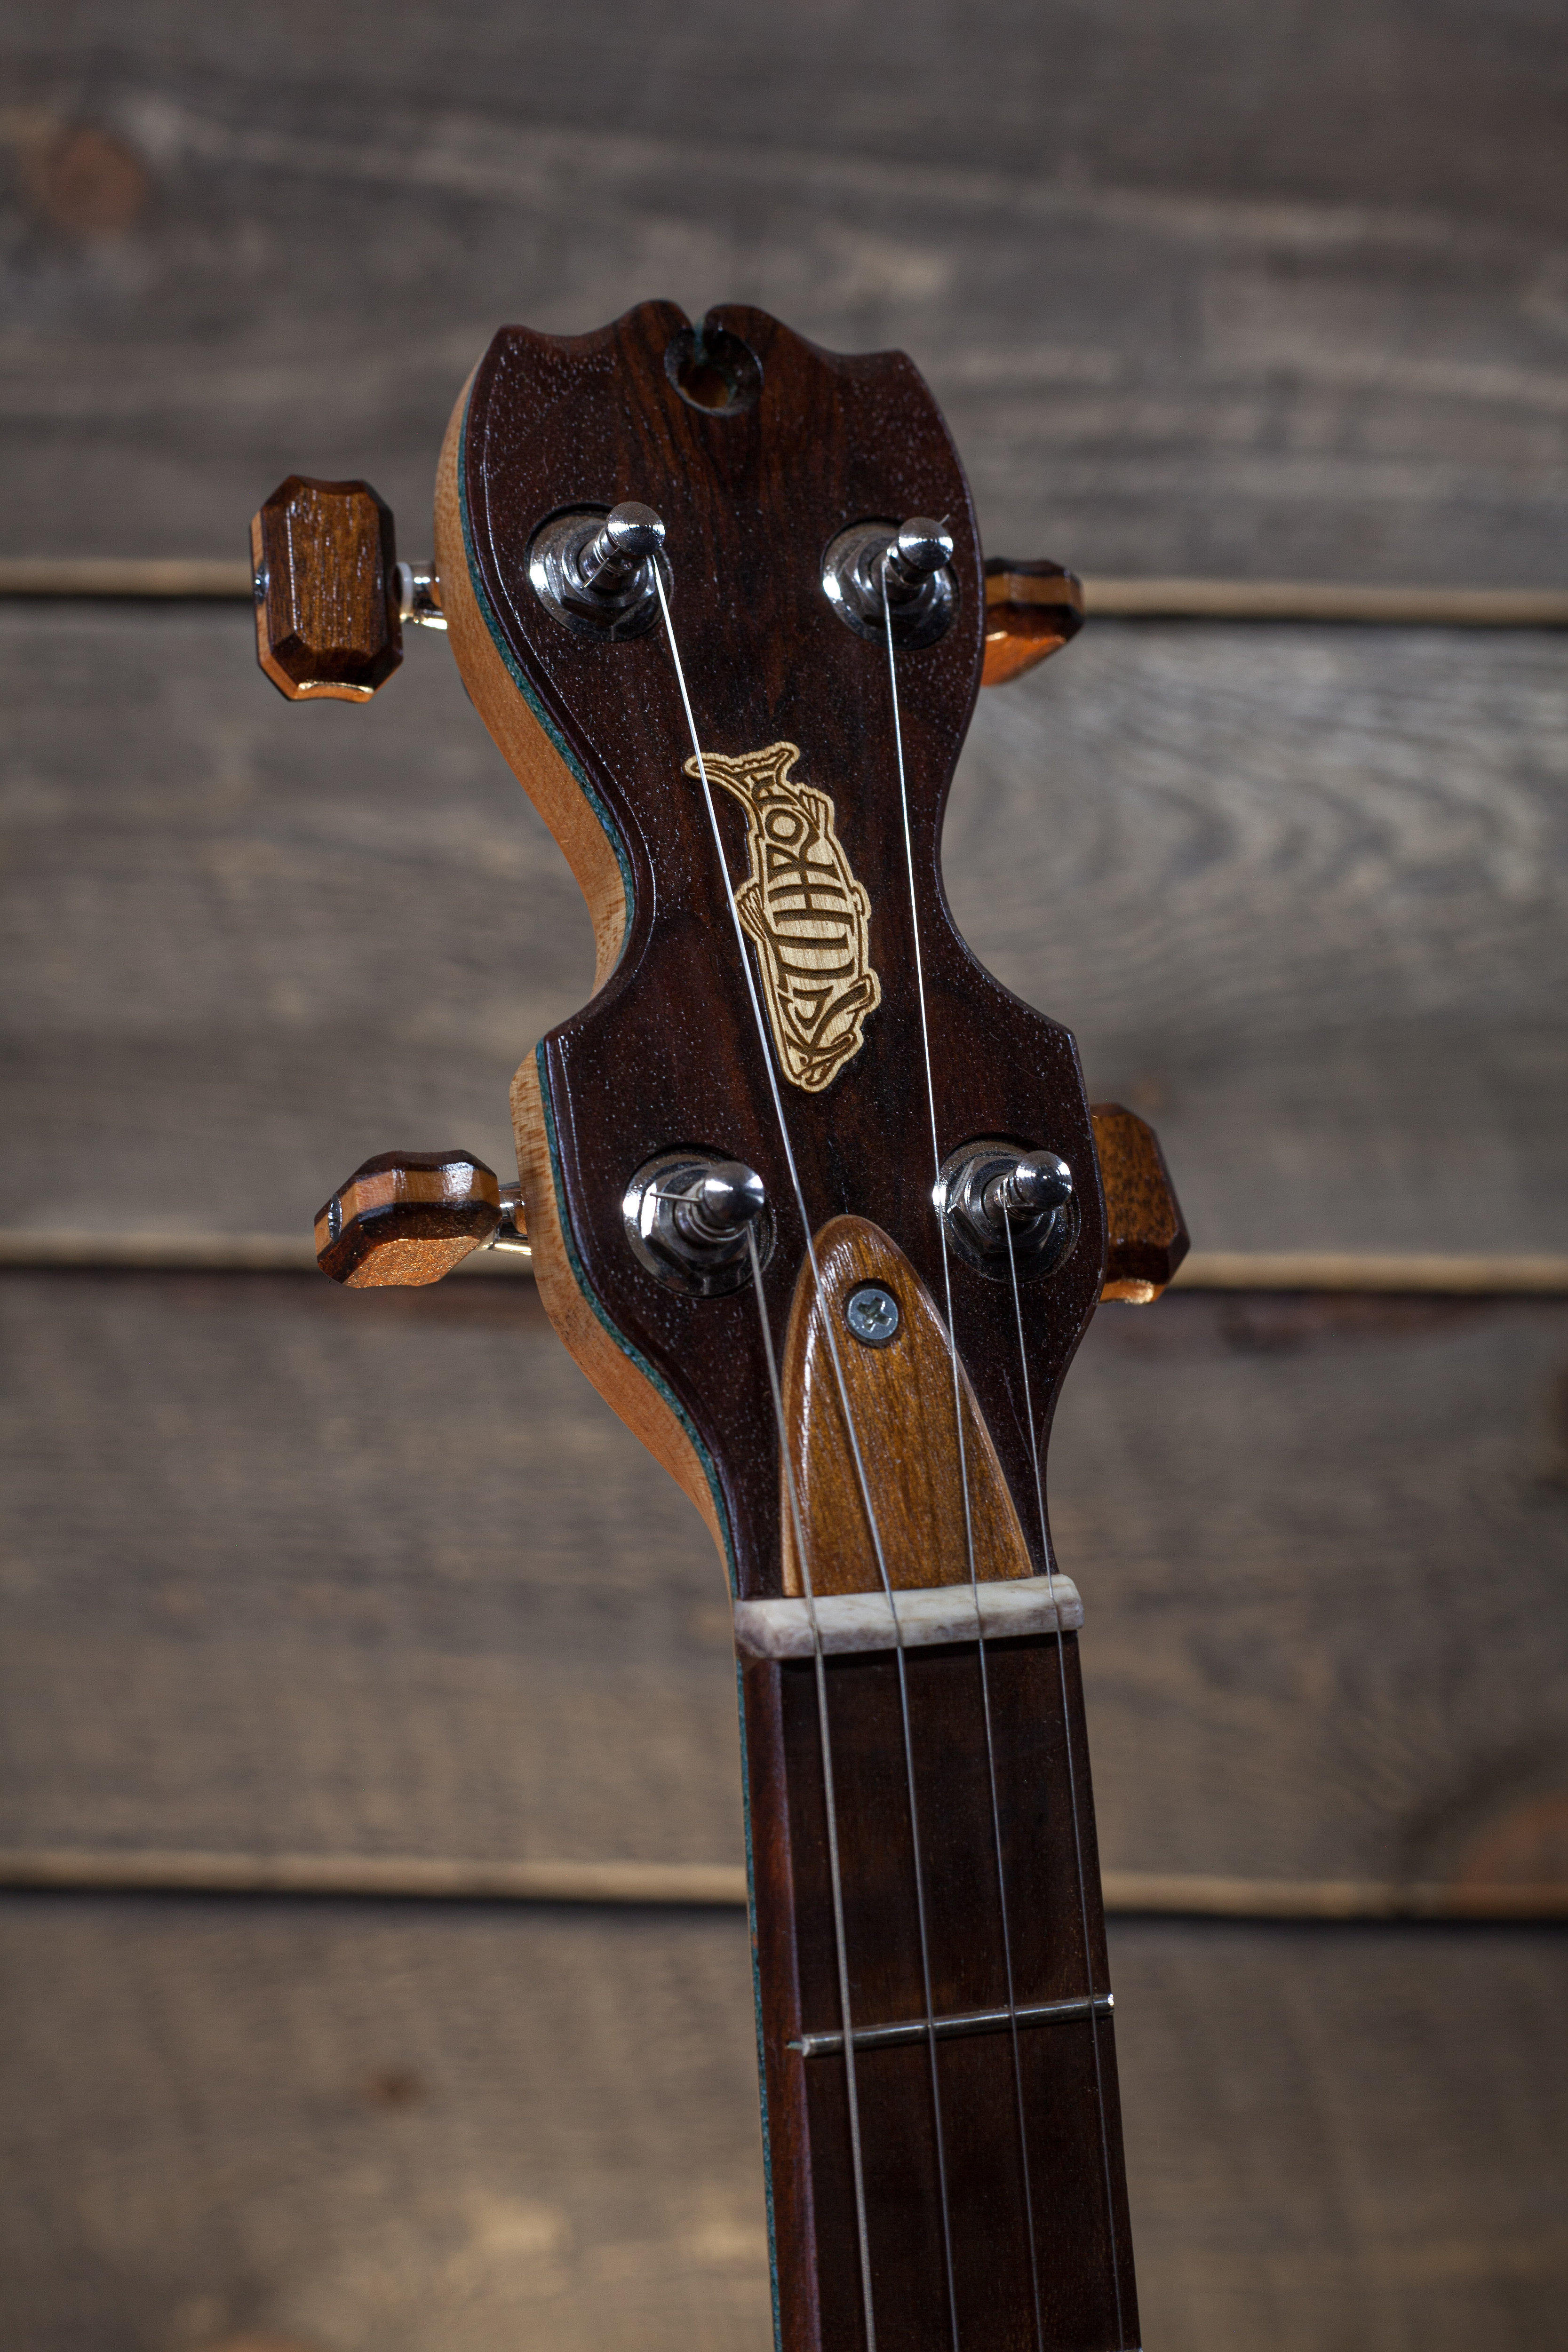 Kutthroat StringWorks Open Back Banjo | RockyMtnGuitarCo